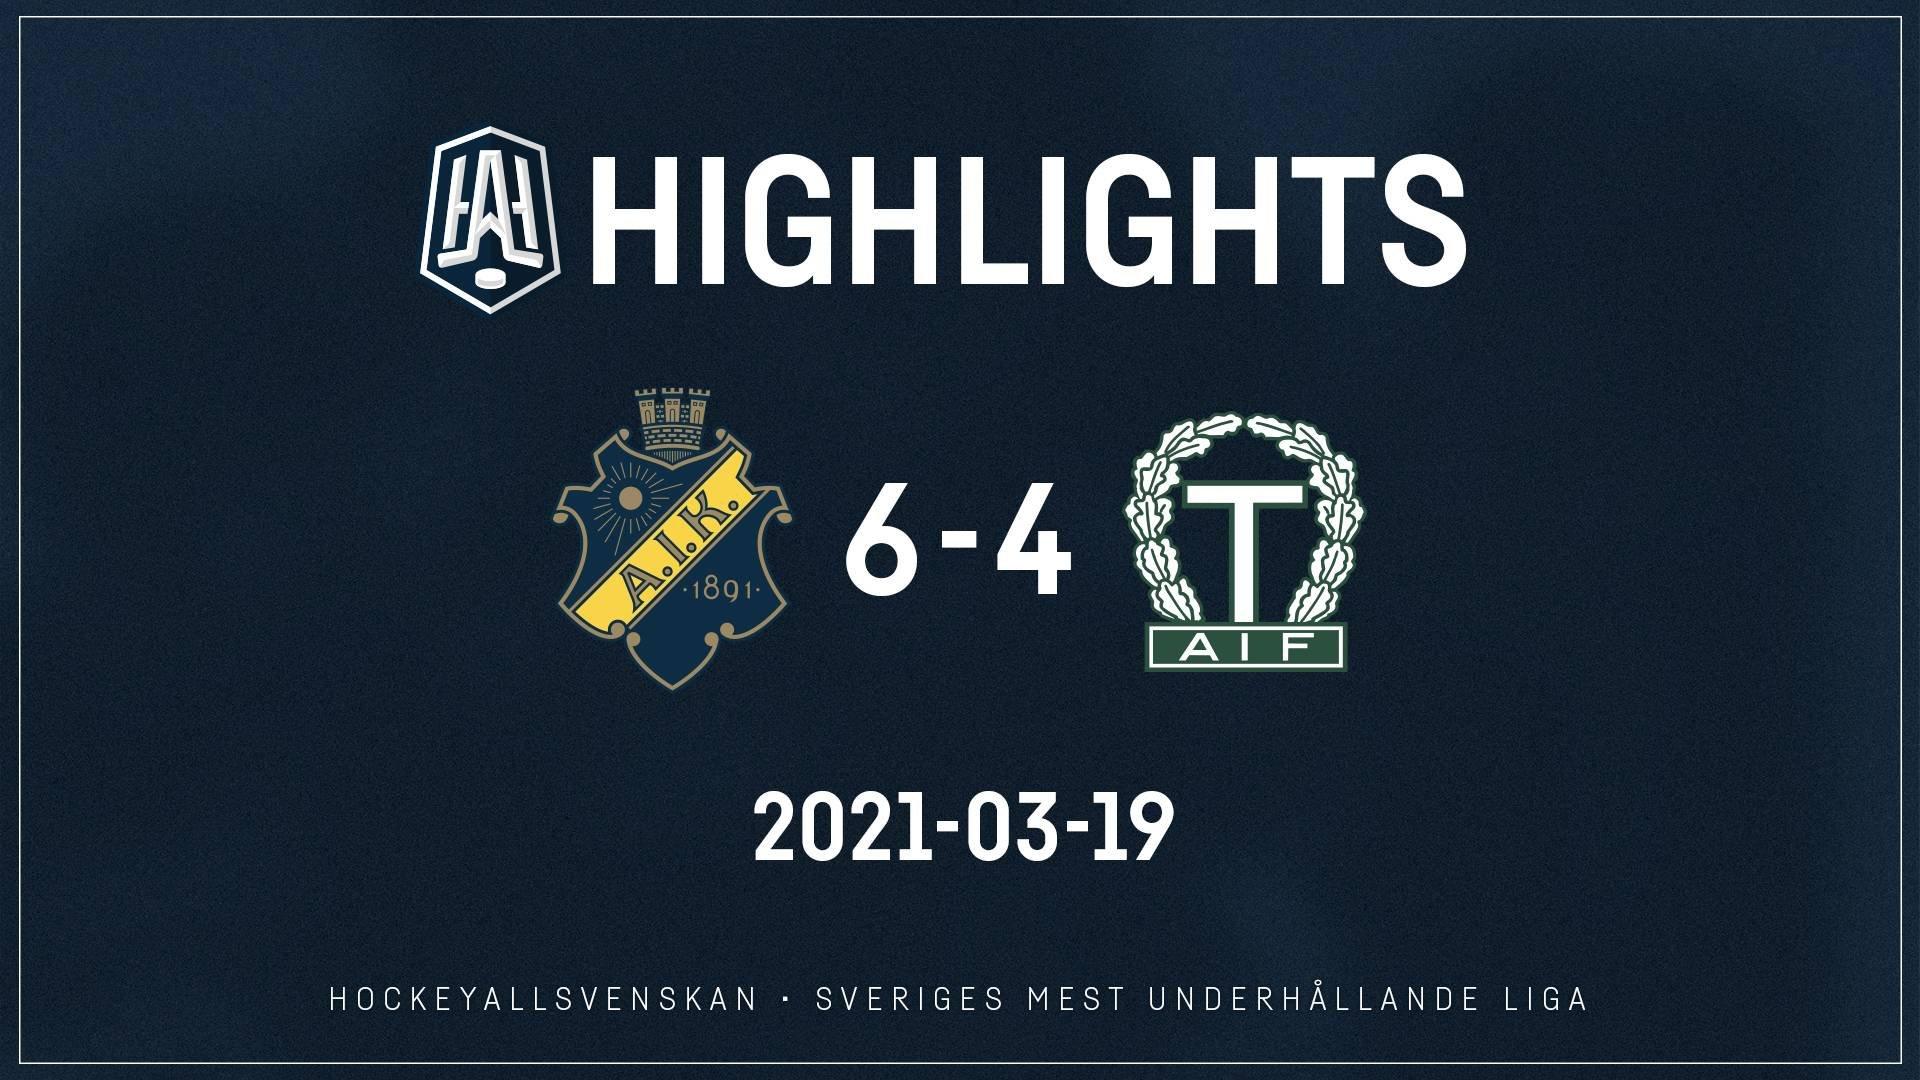 2021-03-19 AIK - Tingsryd 6-4